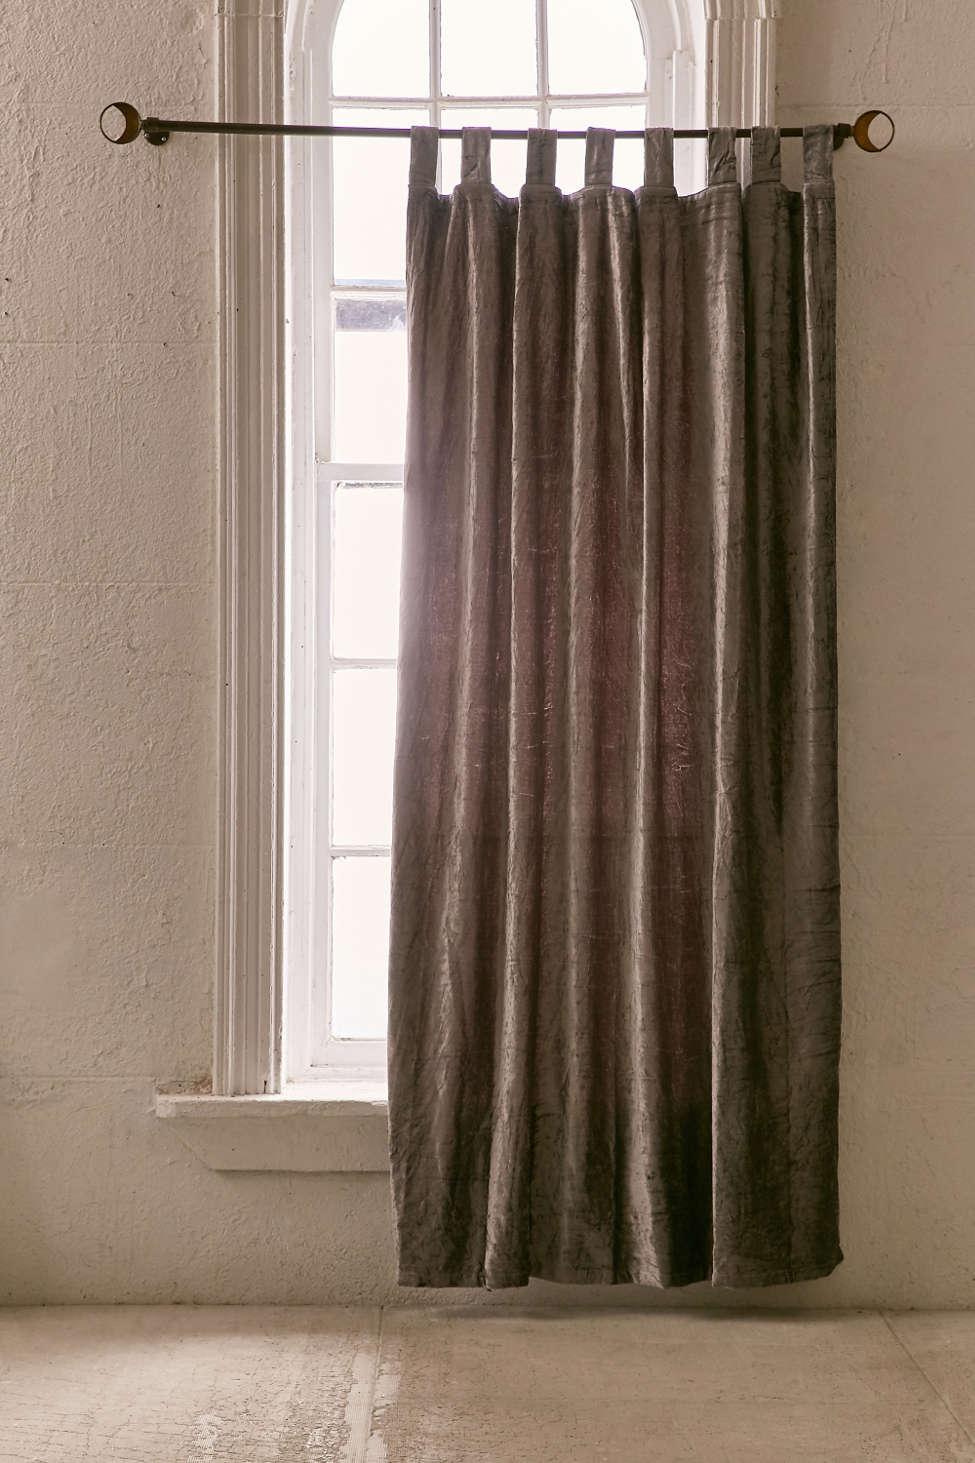 Slide View: 2: Crushed Velvet Window Curtain